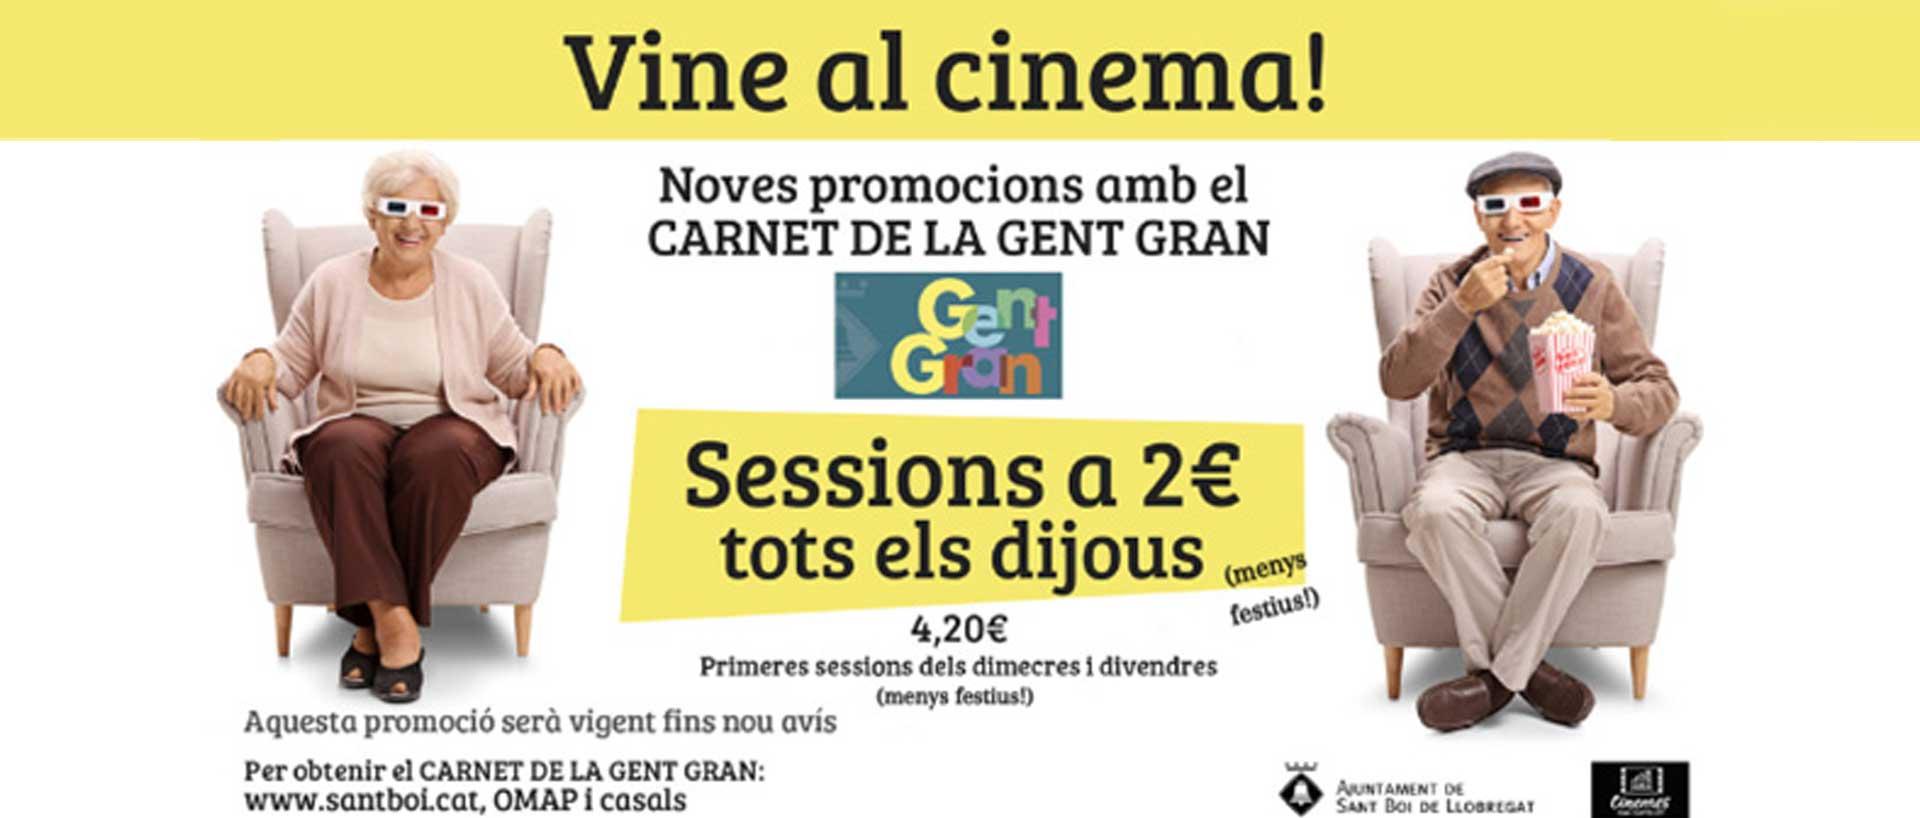 CinesCastellet_PromosmARY-sHELLEYpromo_vine-alcinema.jpg